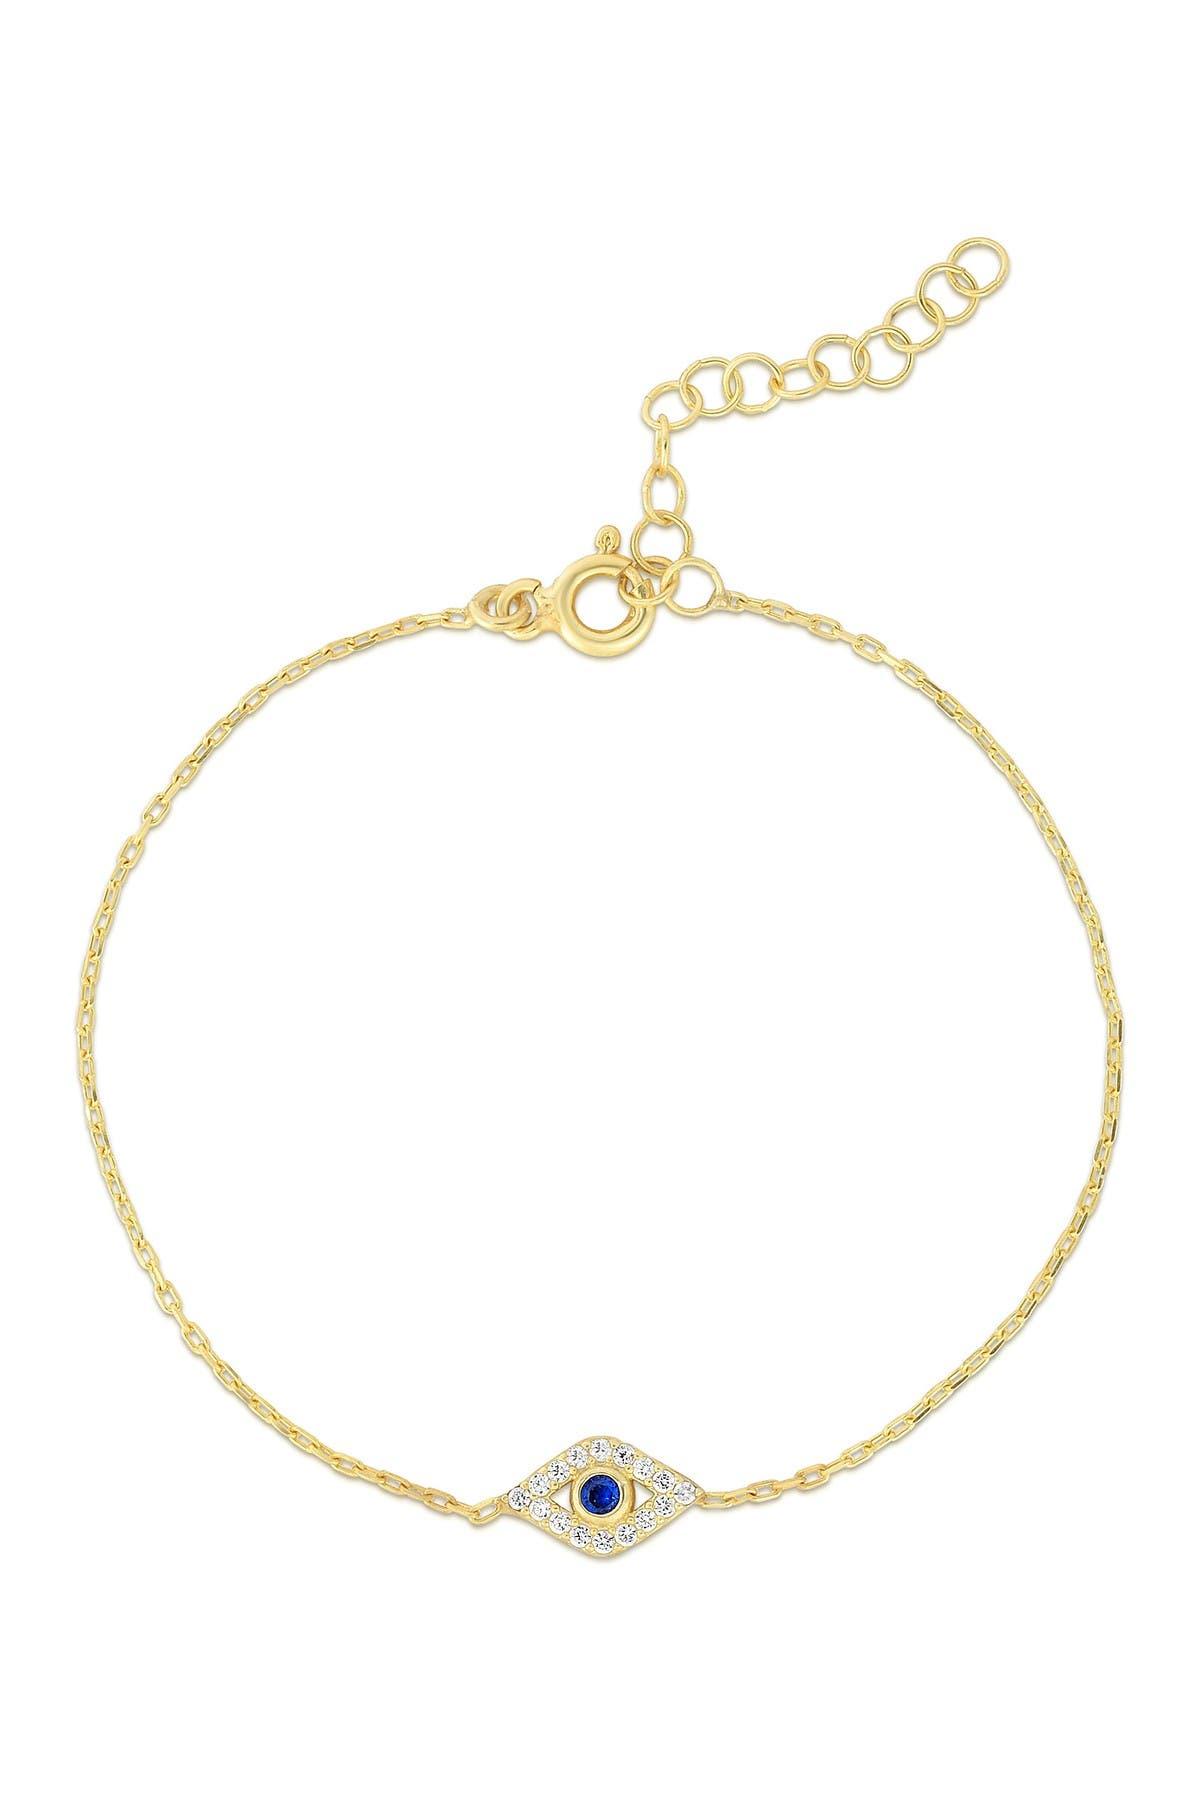 Image of Sphera Milano 14K Gold Plated Sterling Silver Evil Eye Bracelet